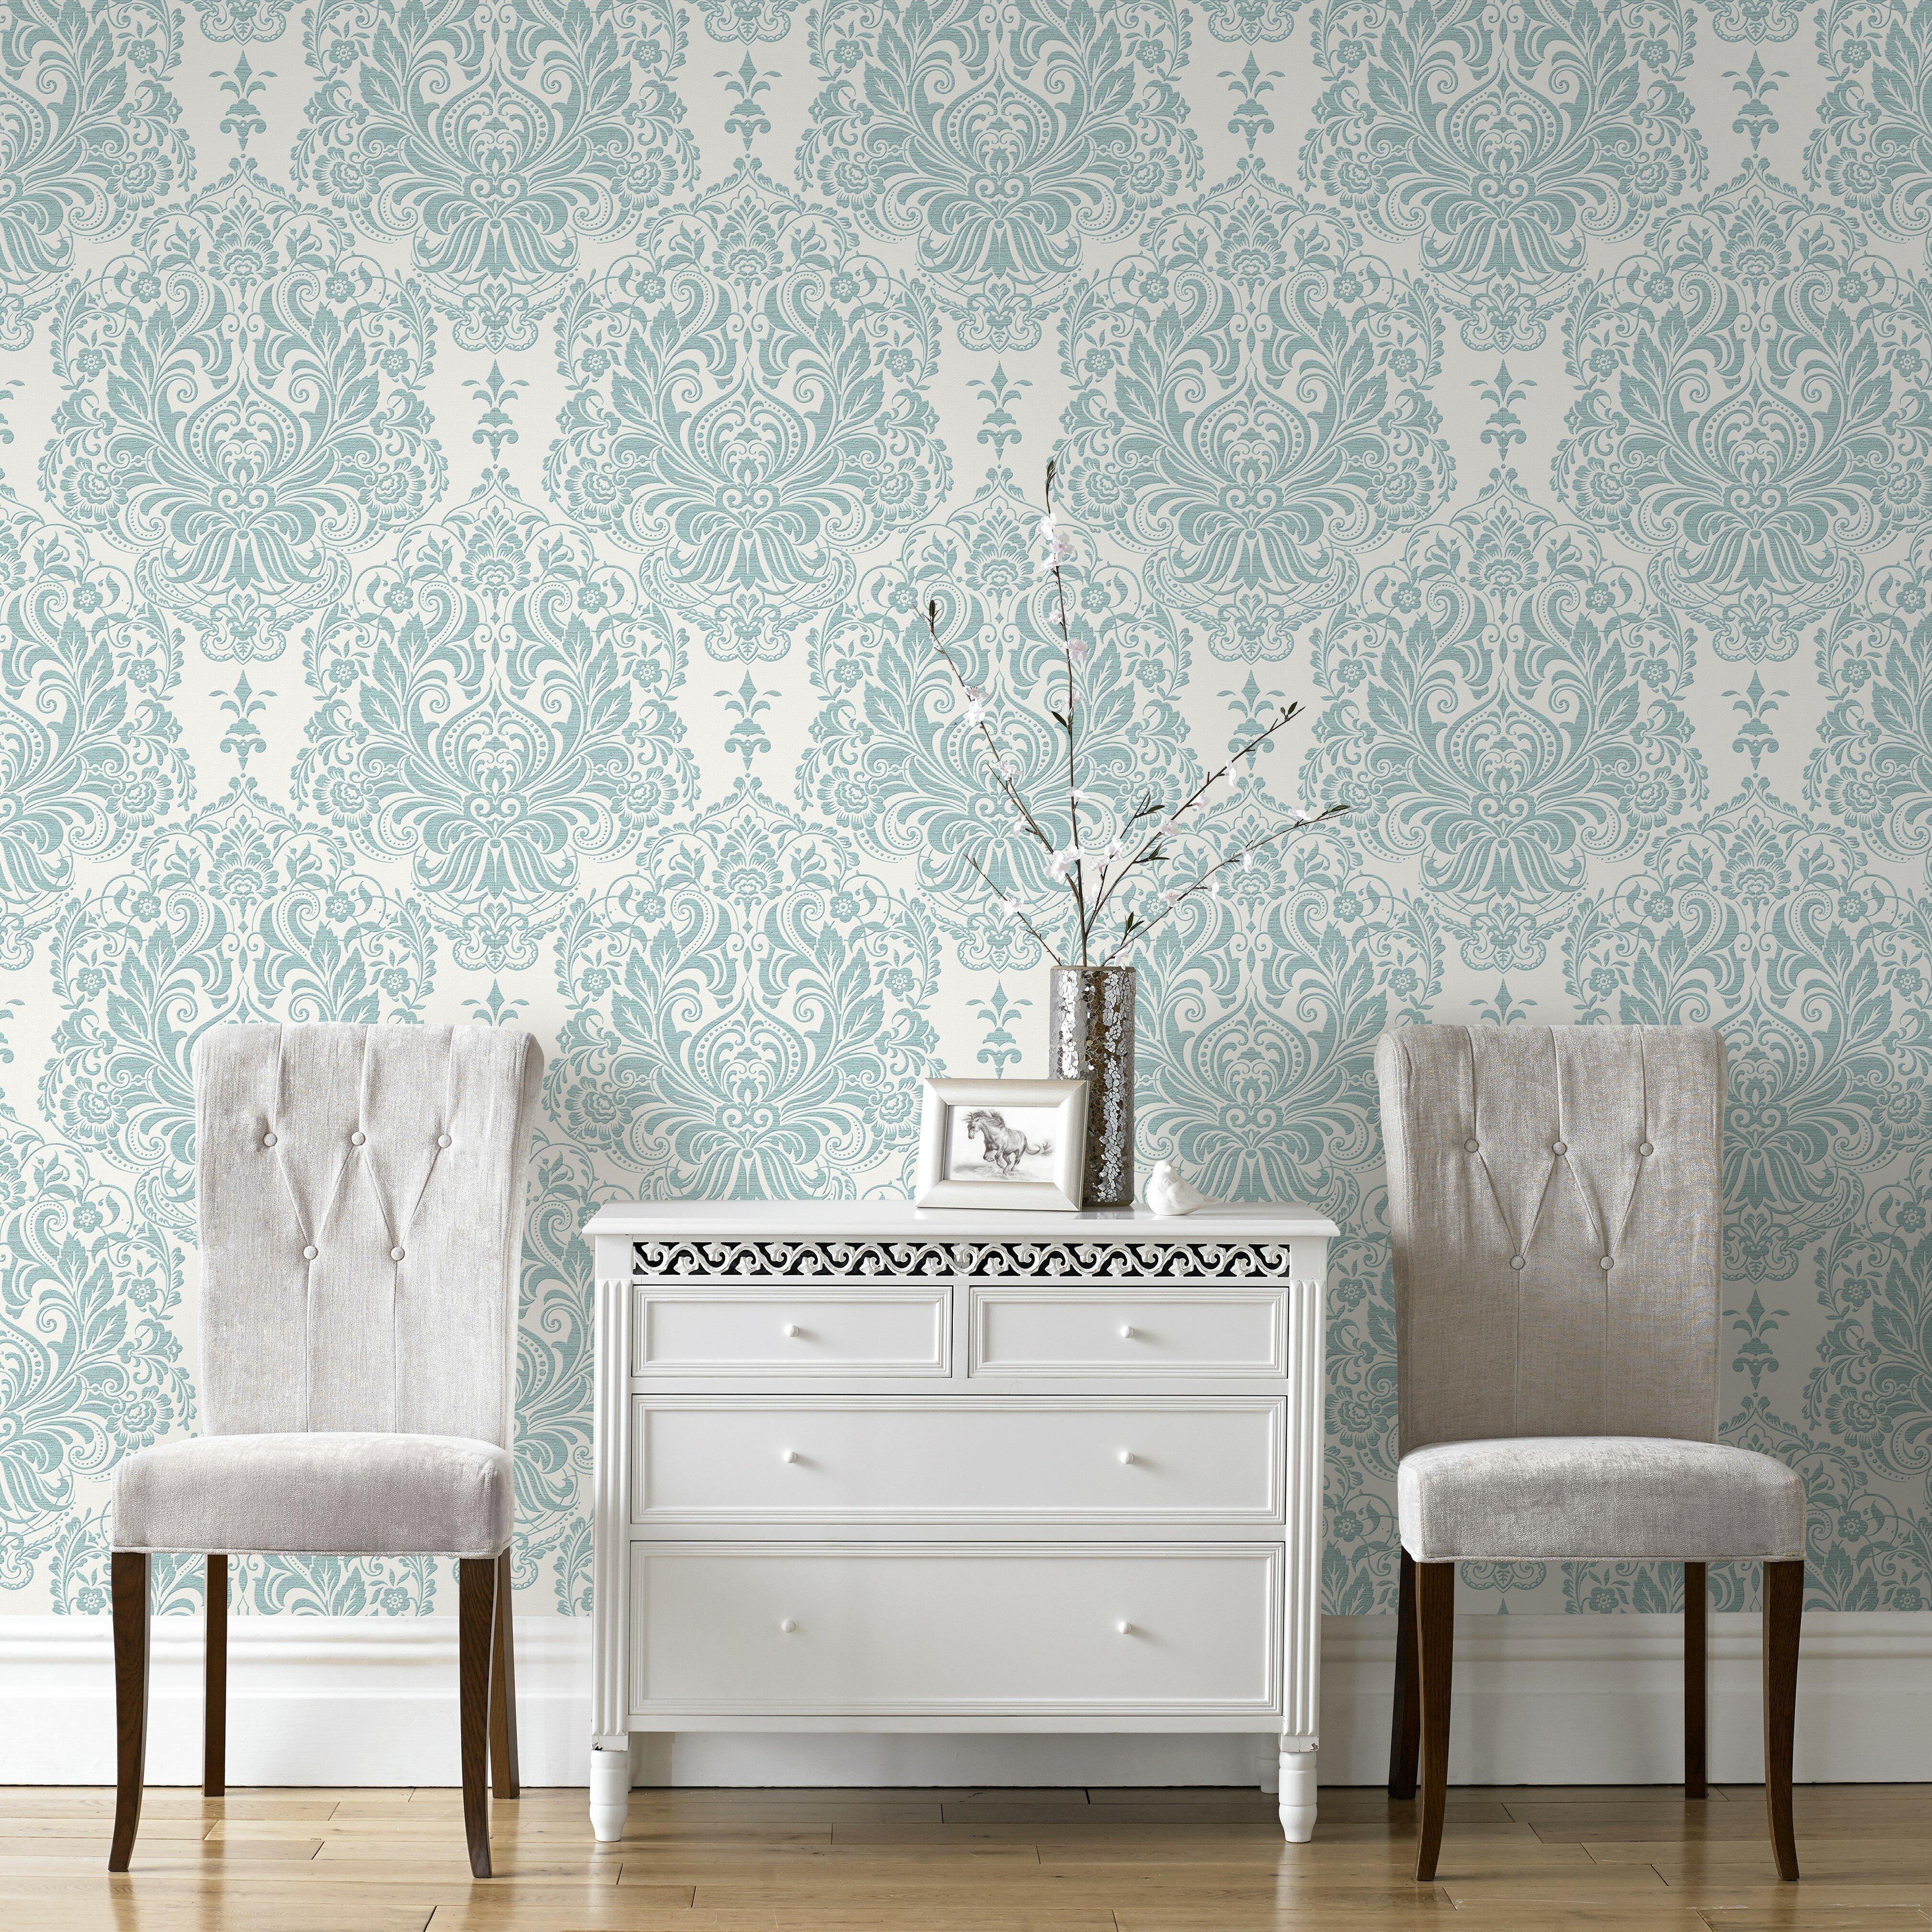 graham brown palais melody 33 39 x 20 damask wallpaper. Black Bedroom Furniture Sets. Home Design Ideas